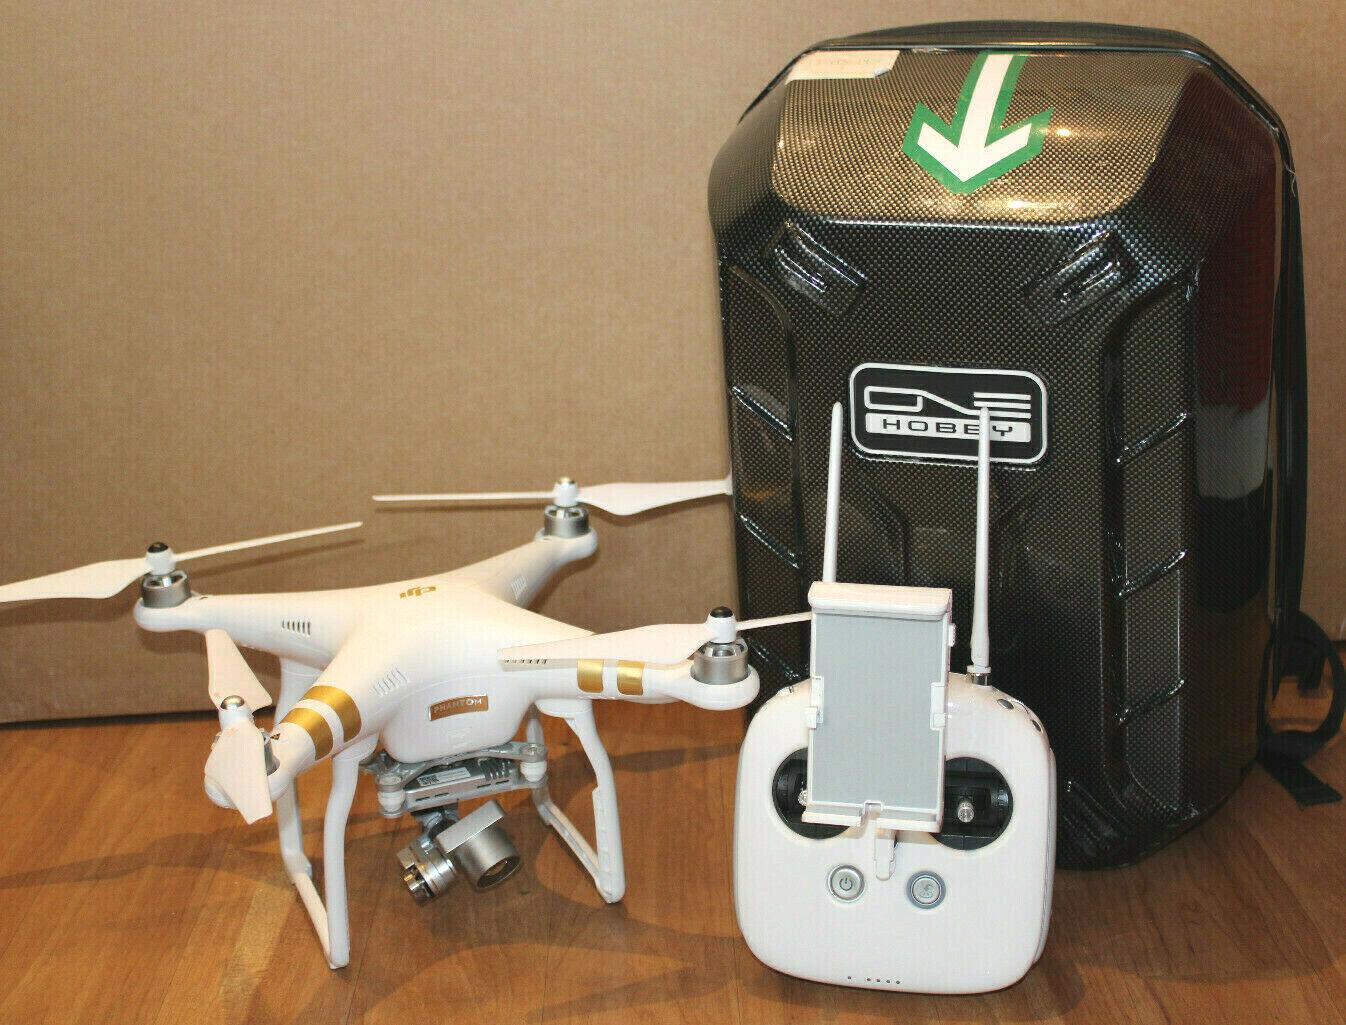 DJI Phantom 3 Professional Quadrokopter - Drohne mit Rucksack & 2 Akku - Weiß